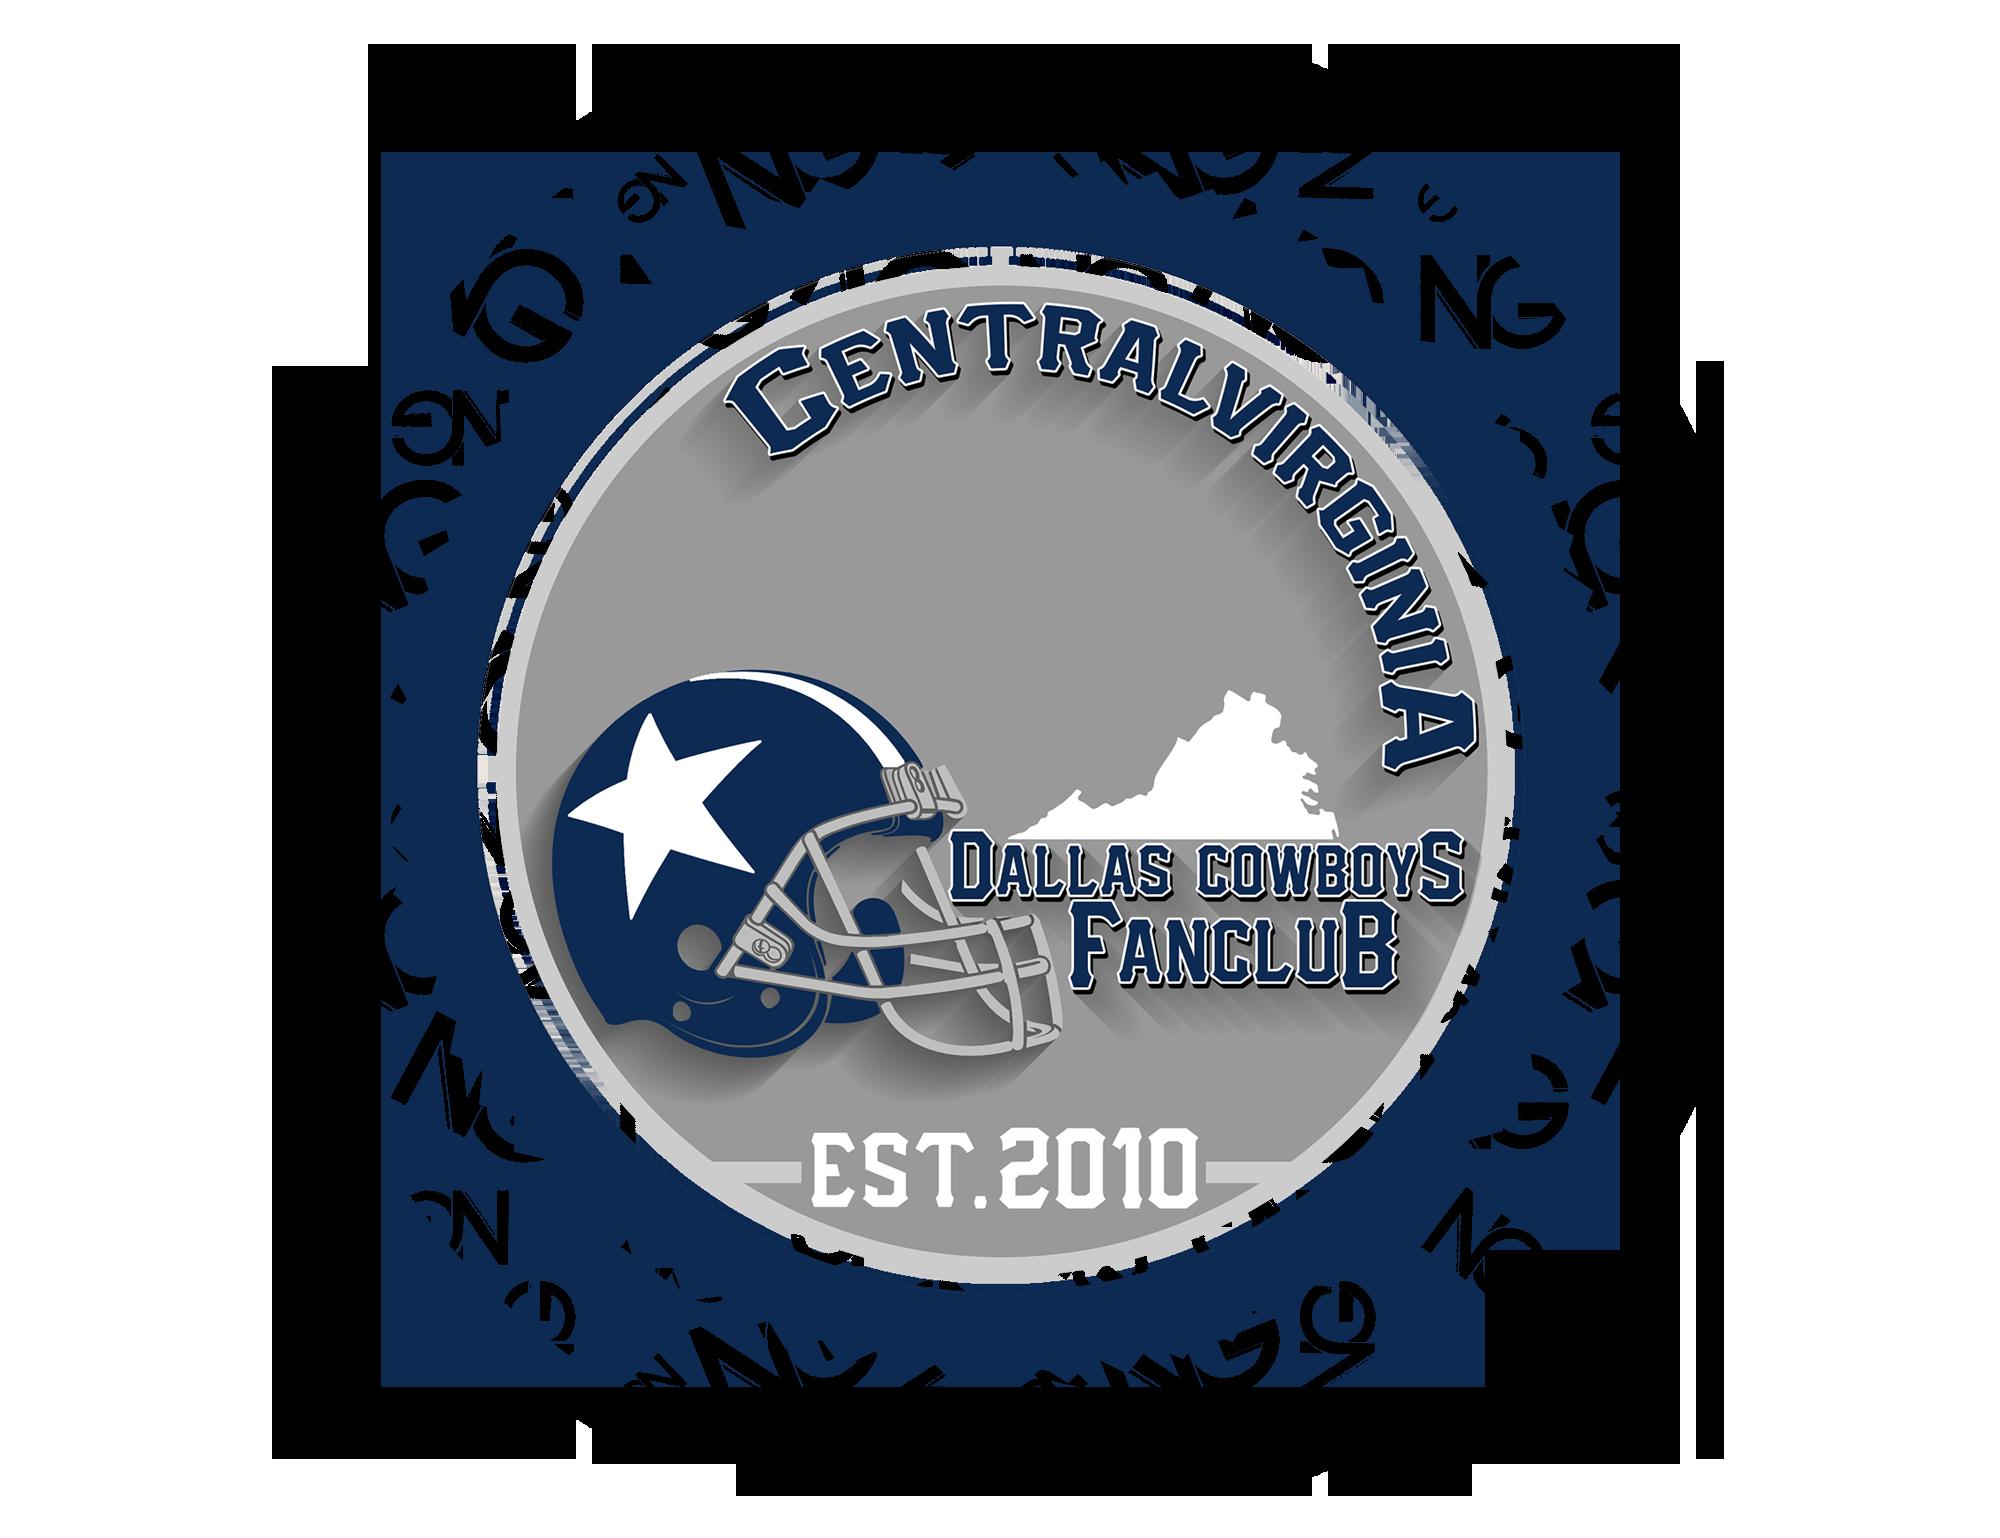 Dallas cowboys clipart badge. Portfolio nashgraphics nashgfx cva